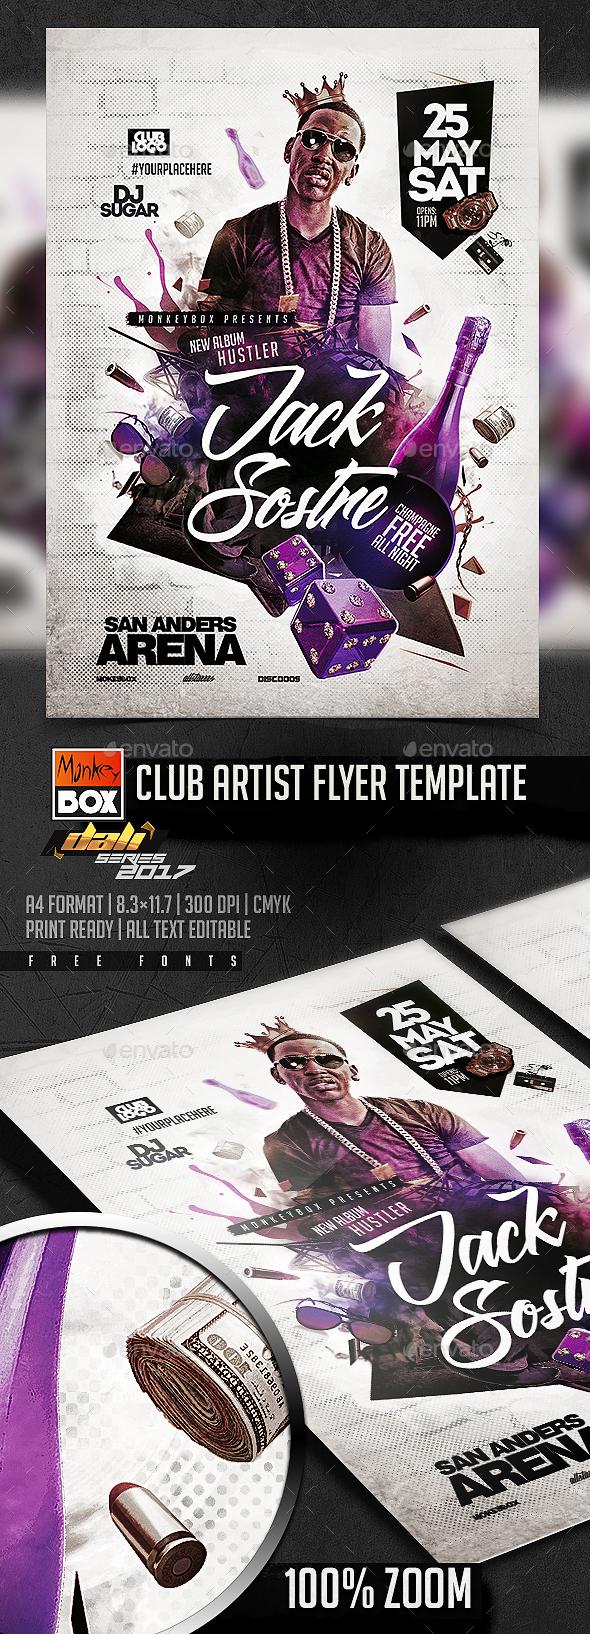 Club Artist Flyer Template - Flyers Print Templates